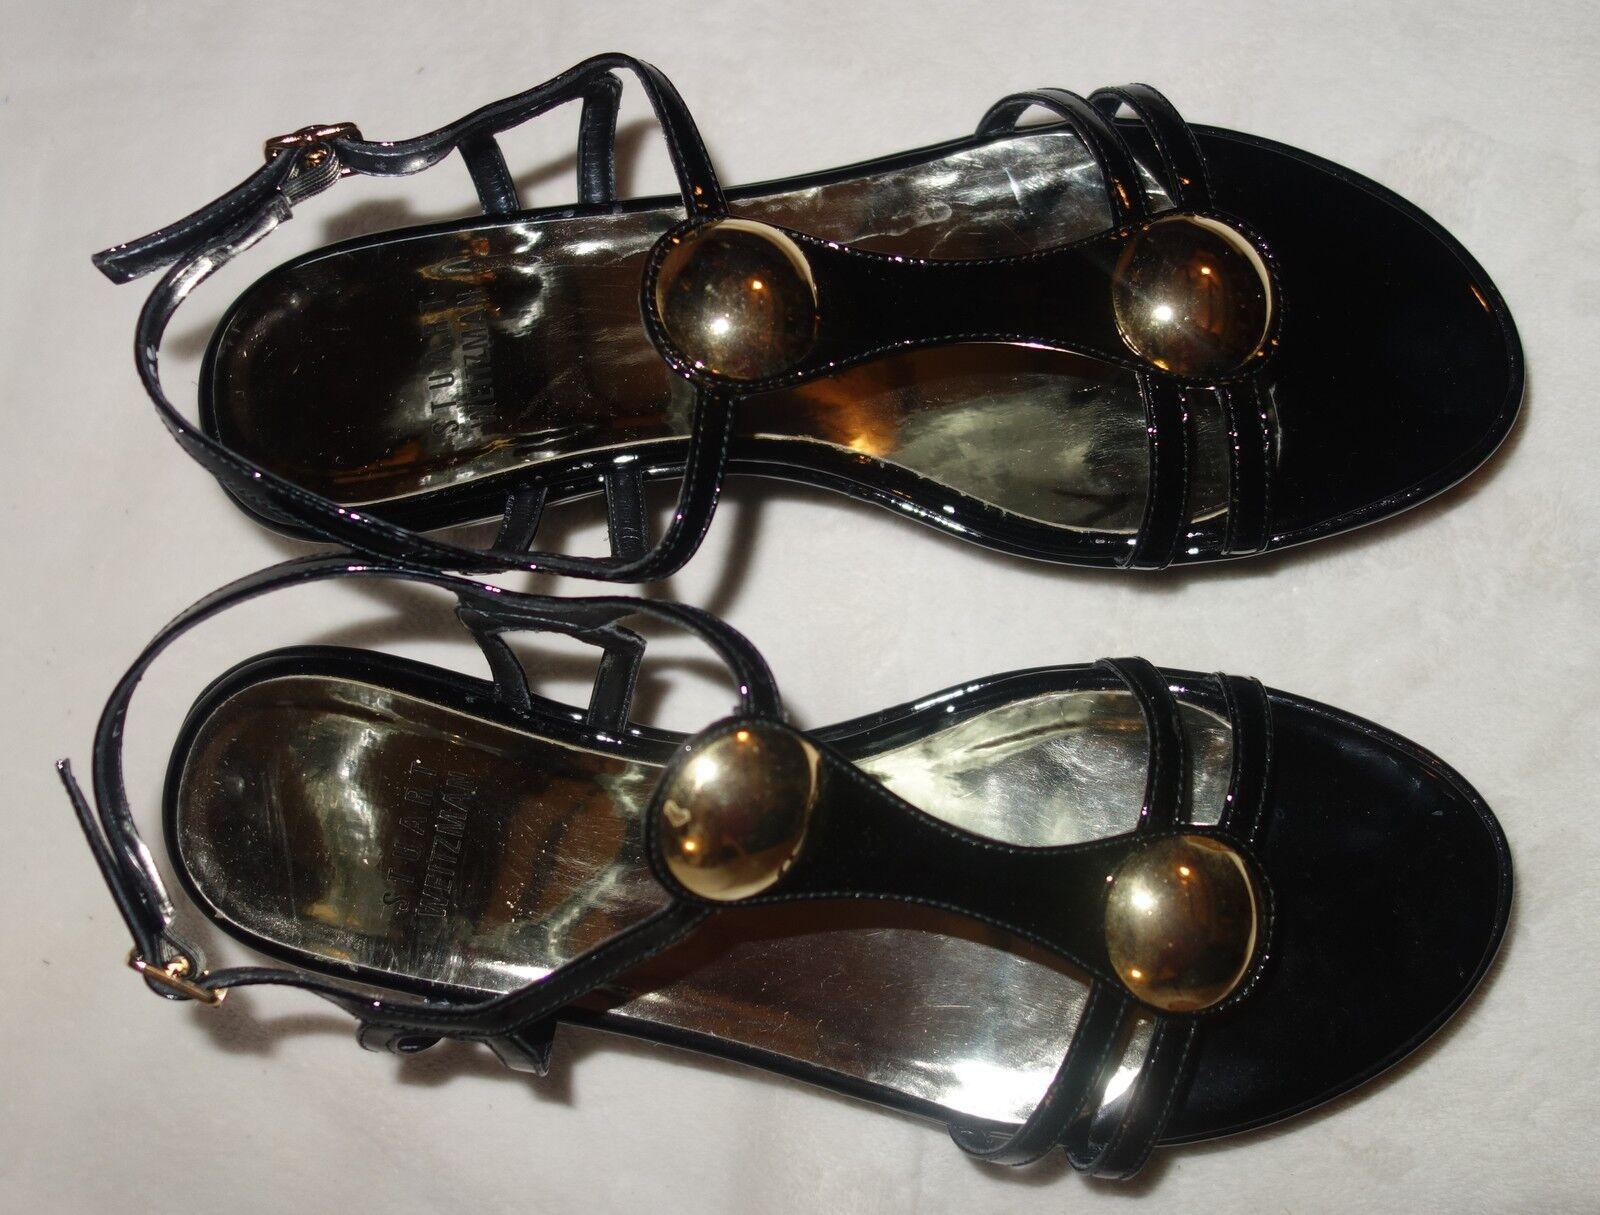 Stuart Weitzman Popup Sandale Soft Patent wedge schuhe sz sz schuhe 36.5 US SZ 6 new 52a963